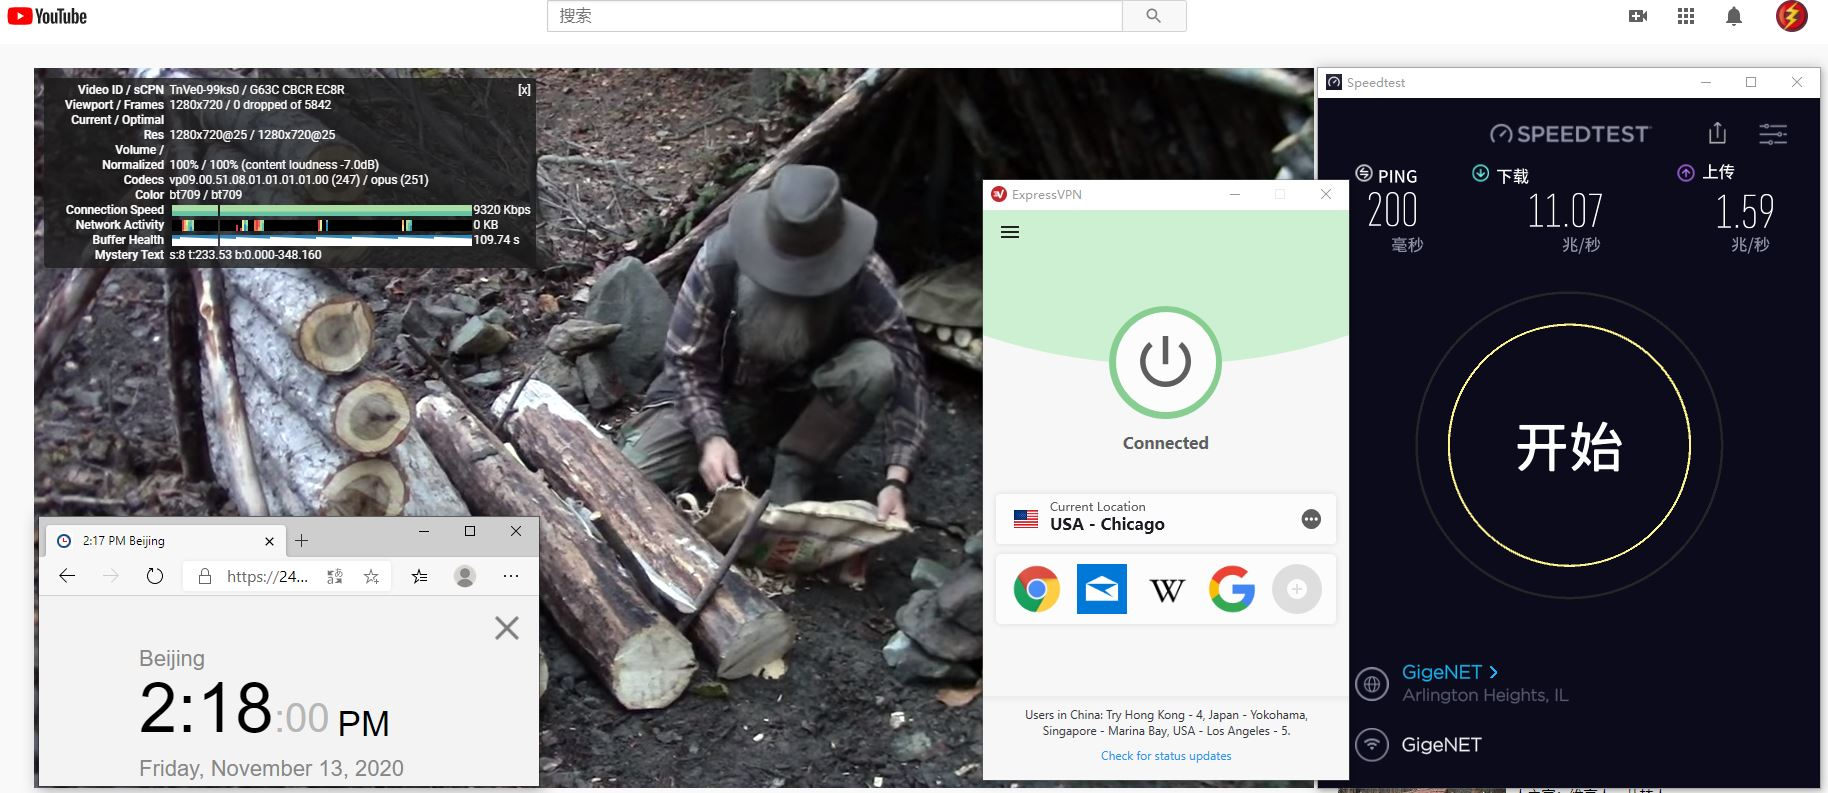 Windows10 ExpressVPN IKEv2 USA - Chicago 服务器 中国VPN 翻墙 科学上网 测试 - 20201113